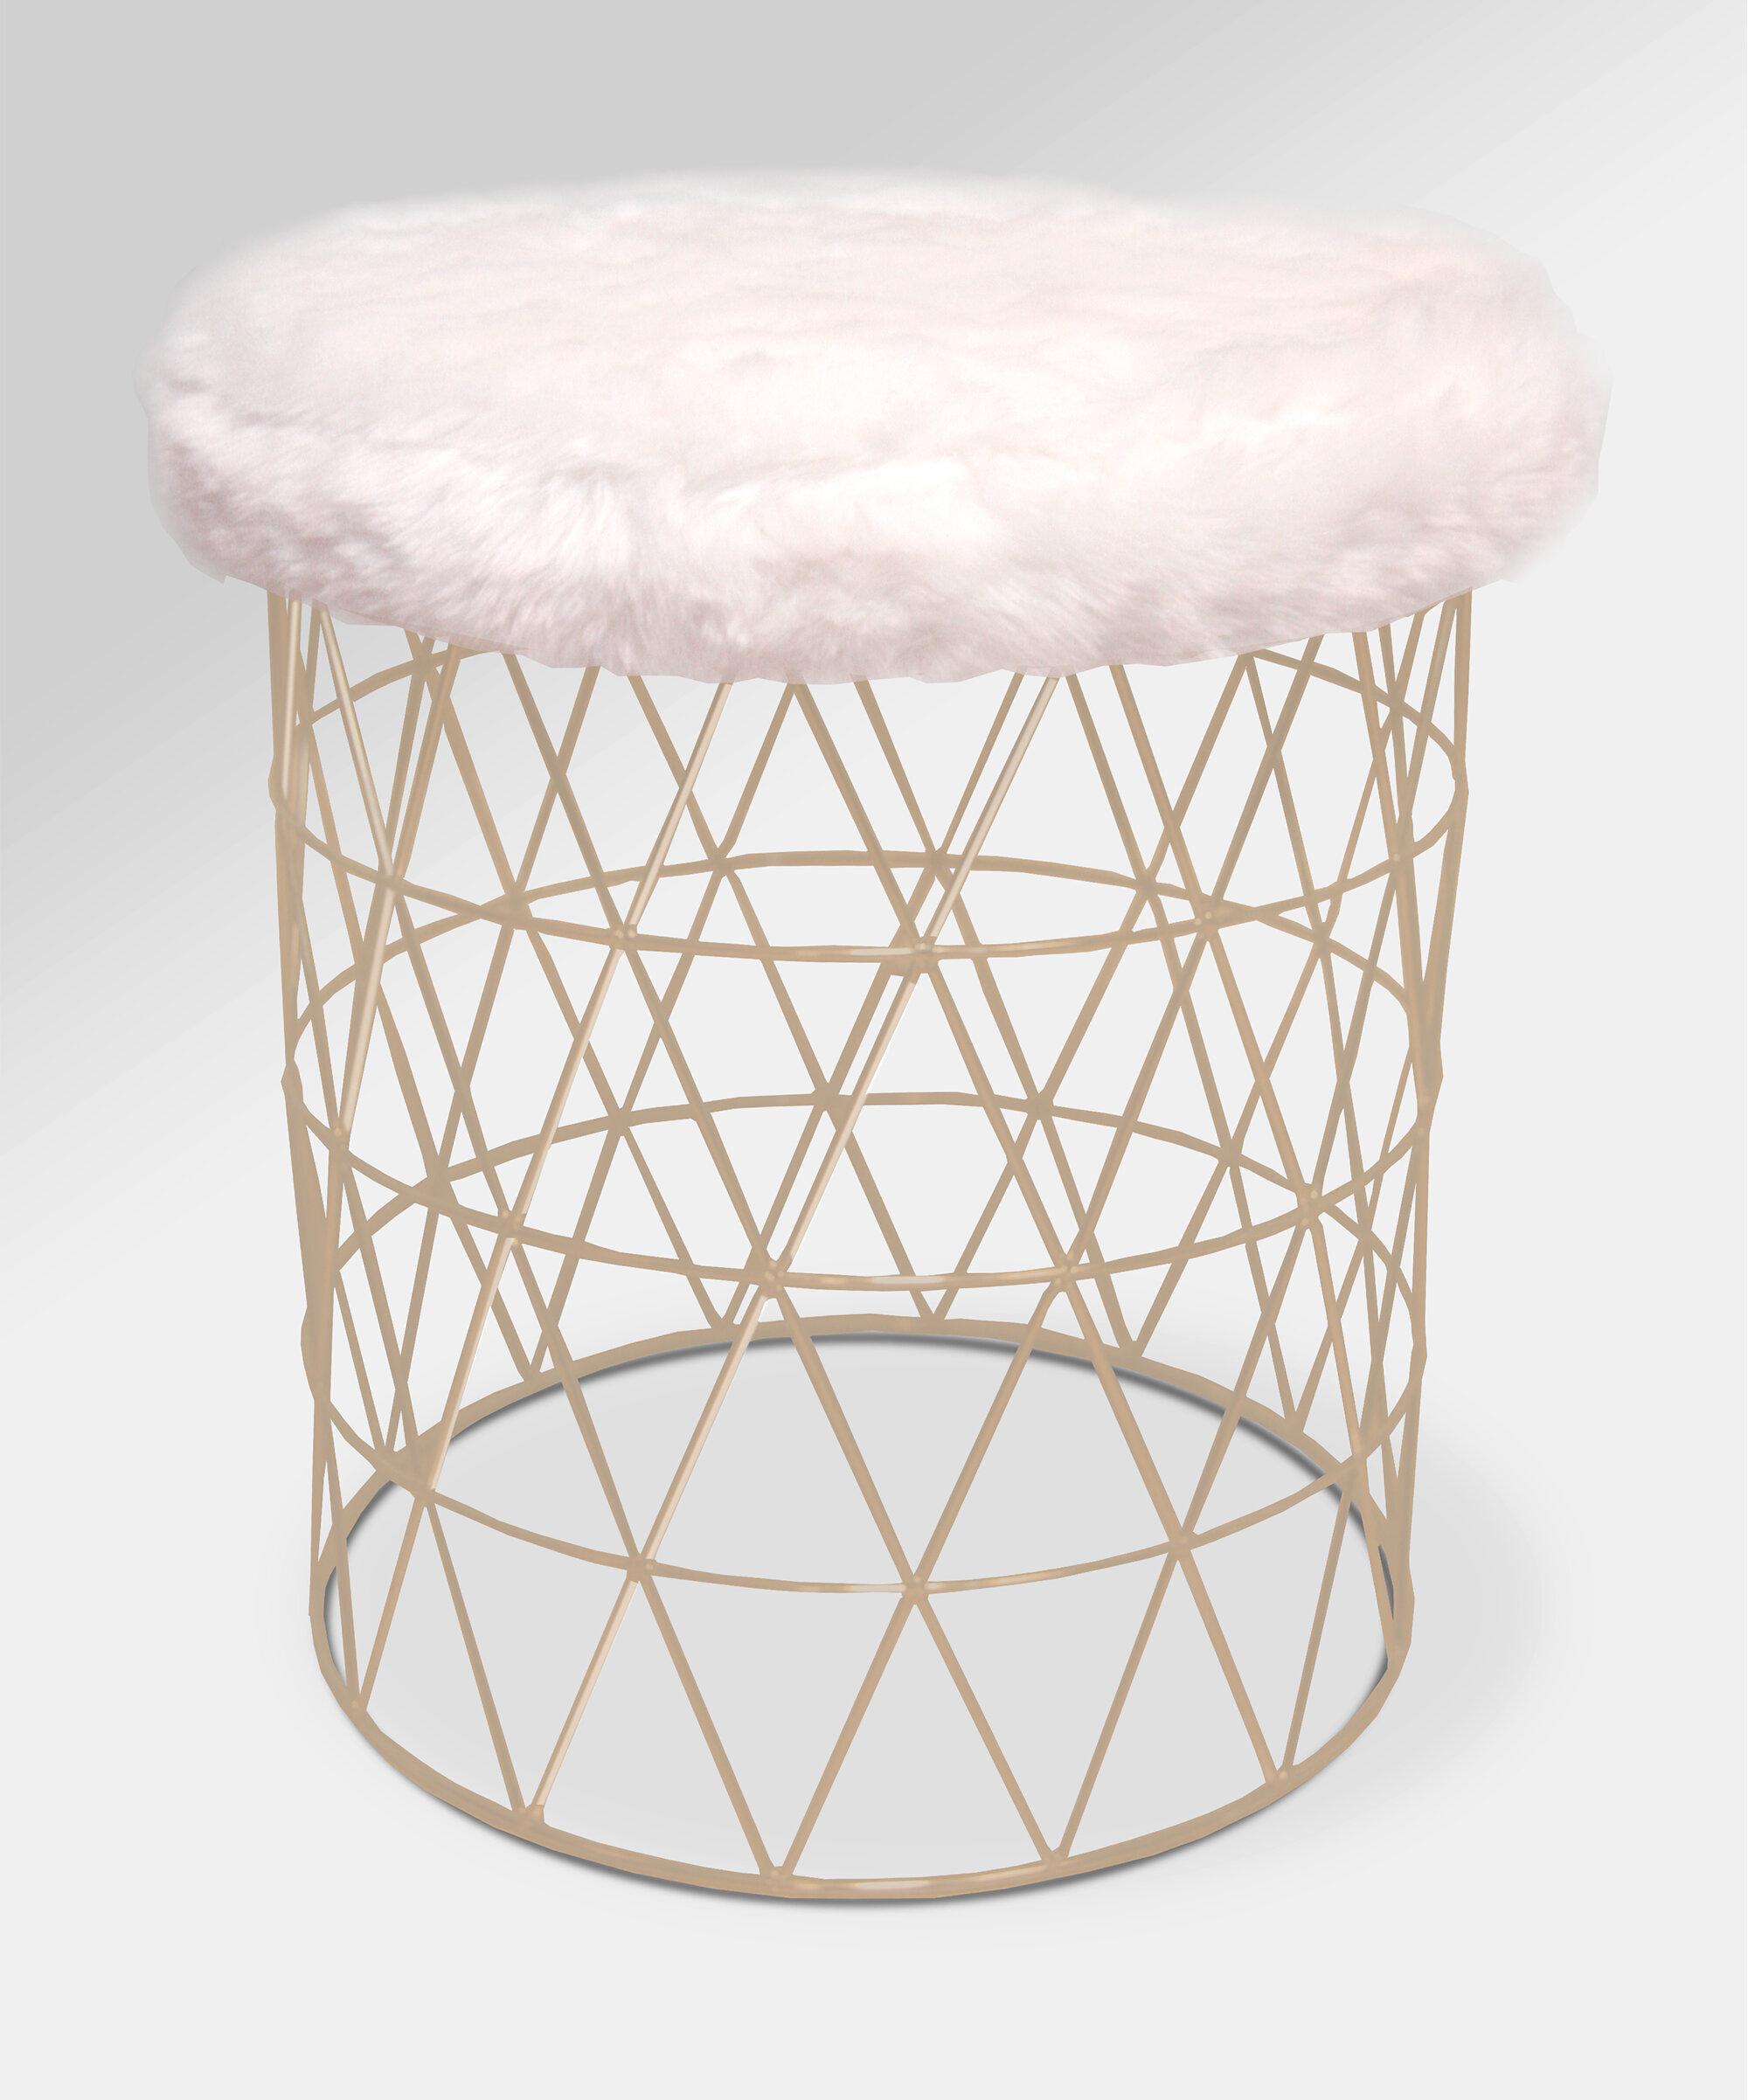 Stupendous Mccarty Modern Furry Round Vanity Stool Machost Co Dining Chair Design Ideas Machostcouk